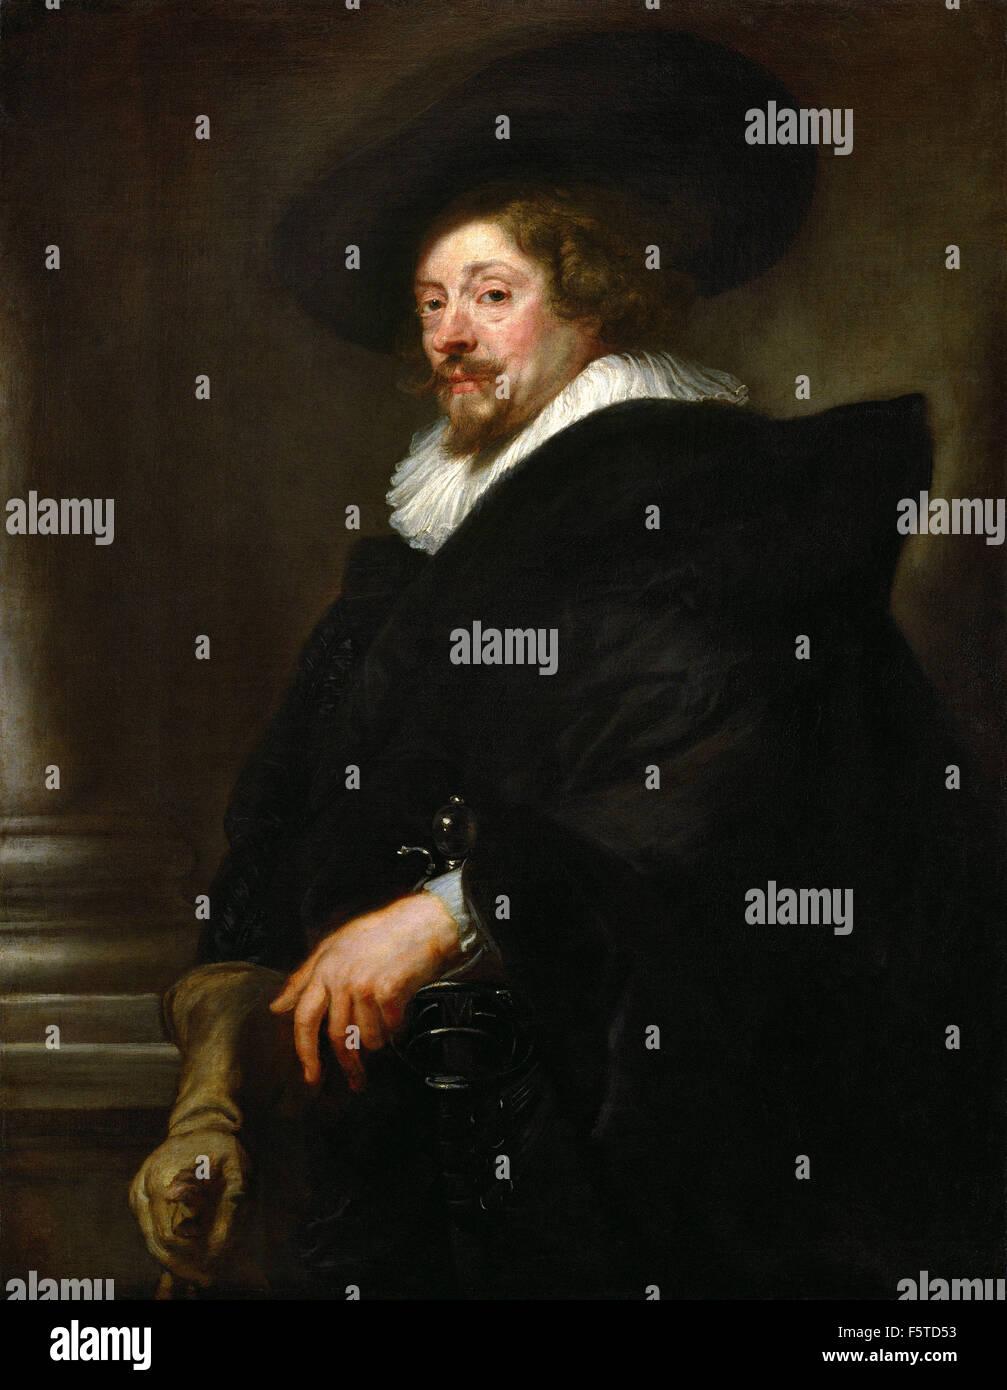 Peter Paul Rubens - Self portrait 60 - Stock Image